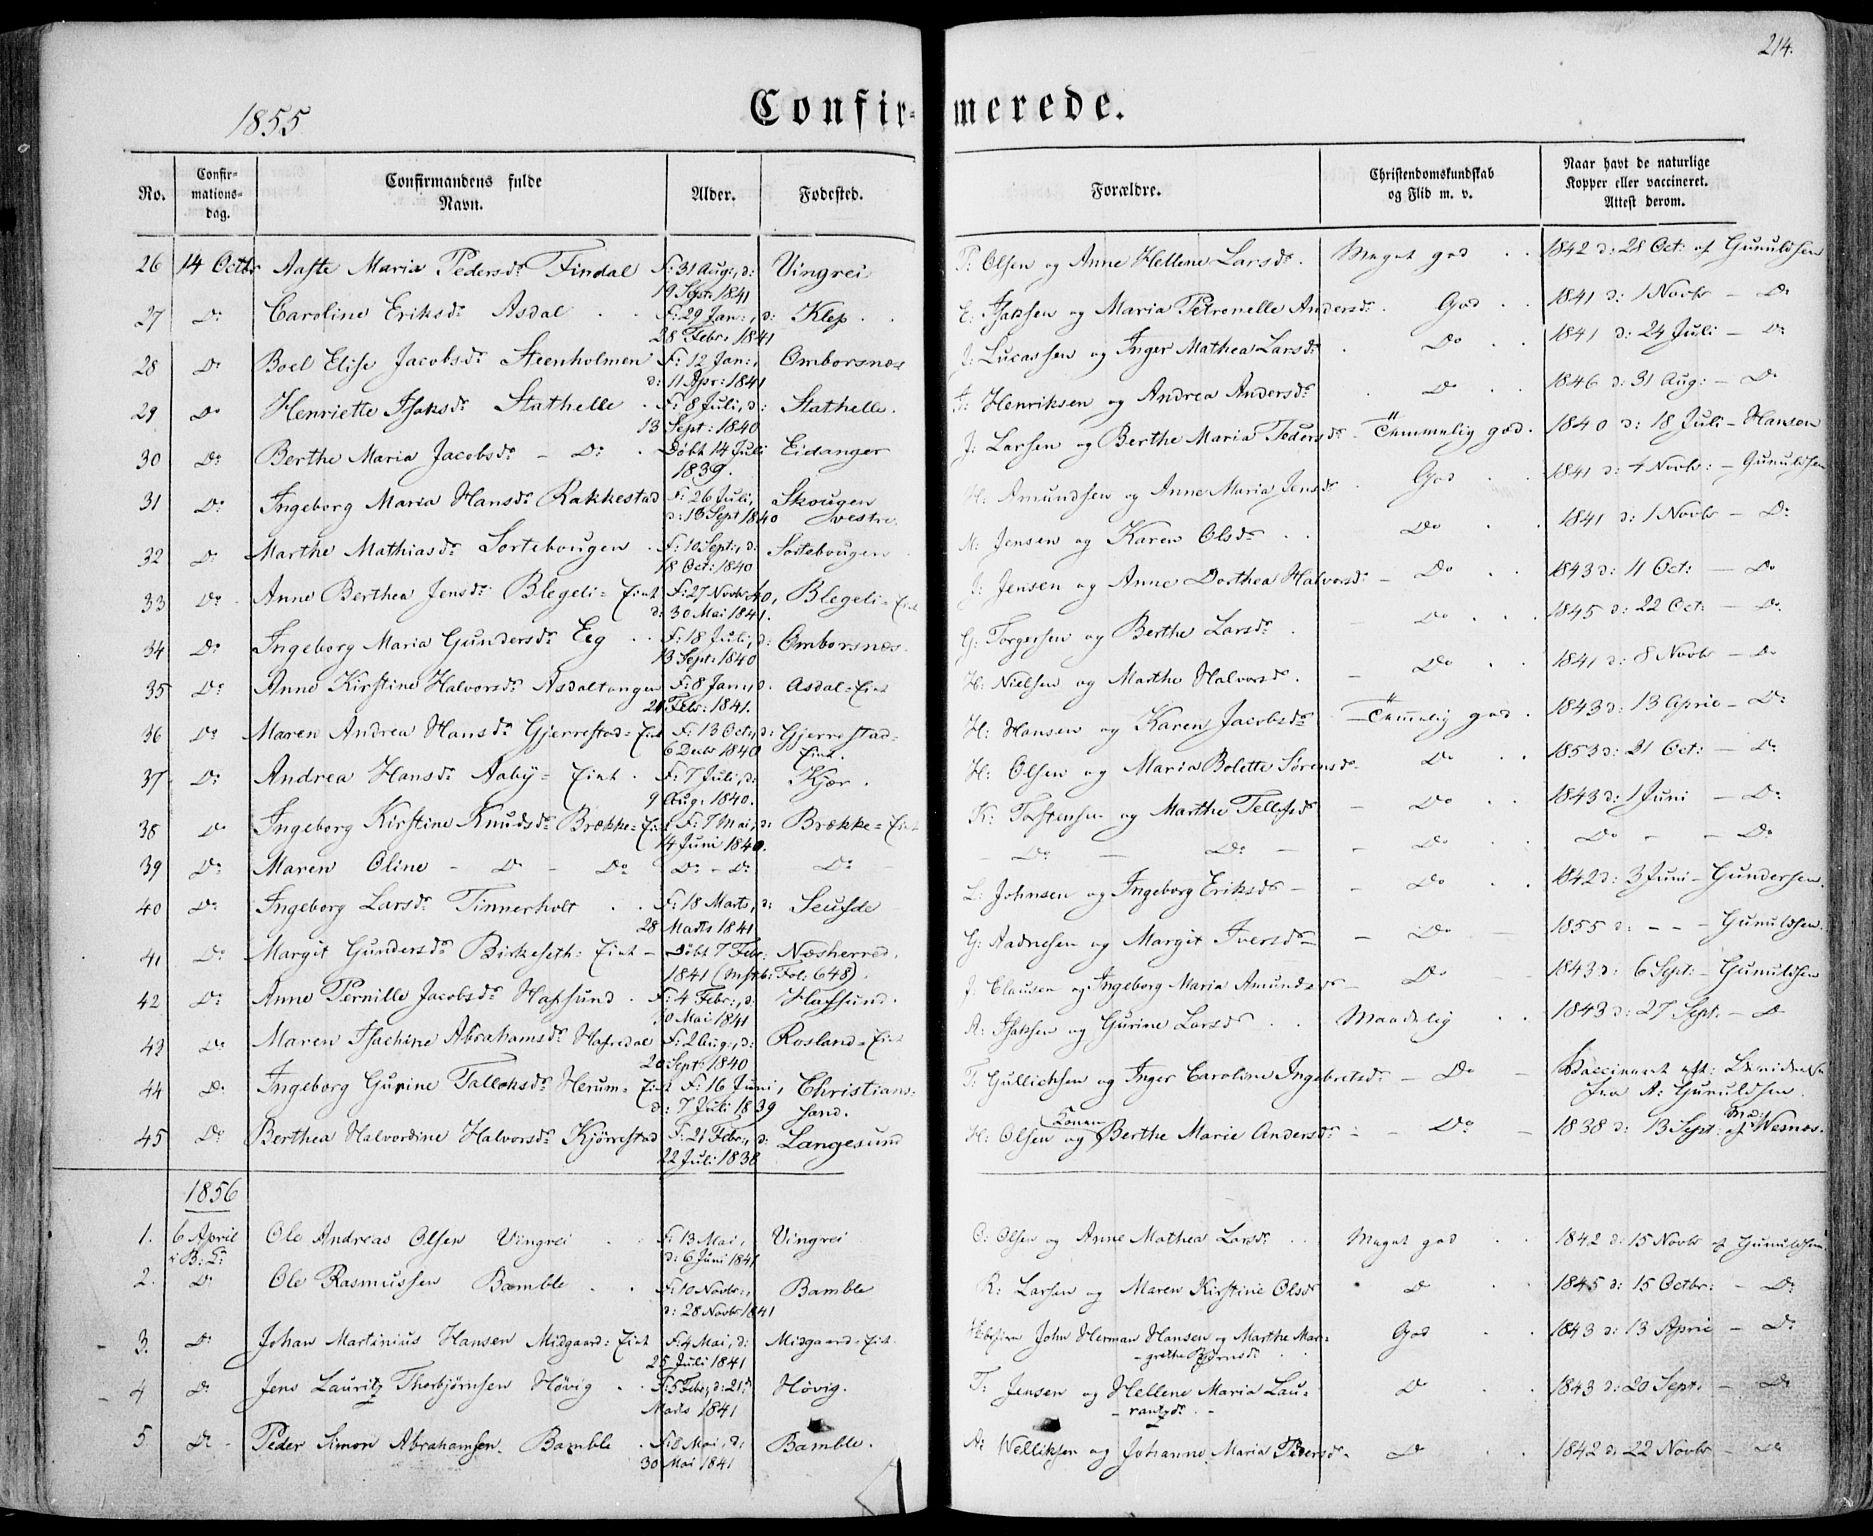 SAKO, Bamble kirkebøker, F/Fa/L0005: Ministerialbok nr. I 5, 1854-1869, s. 214